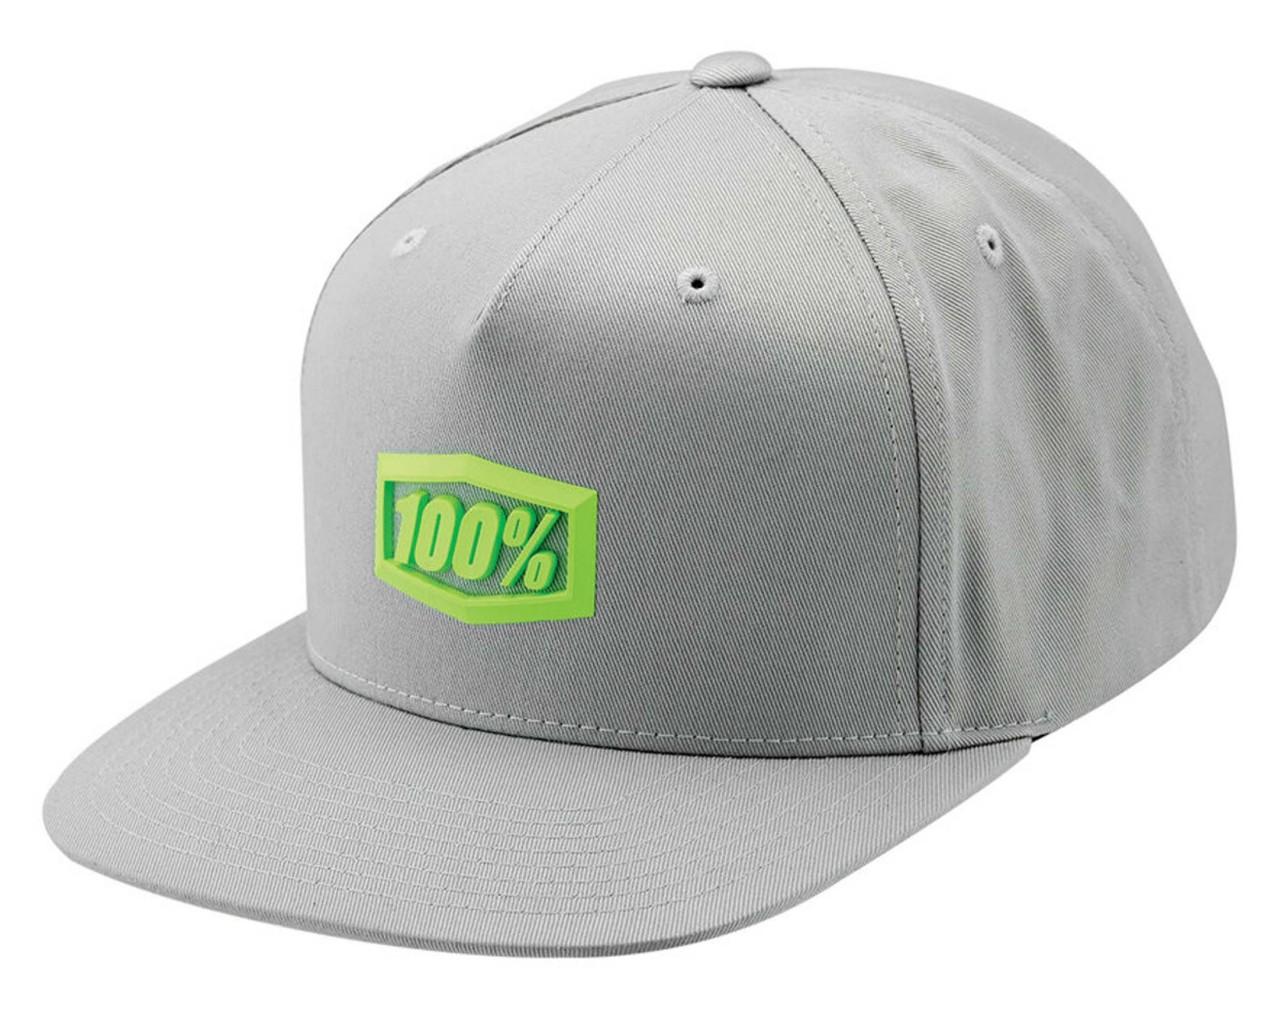 100% Enterprise 2019 Snapback Hat | Vapor